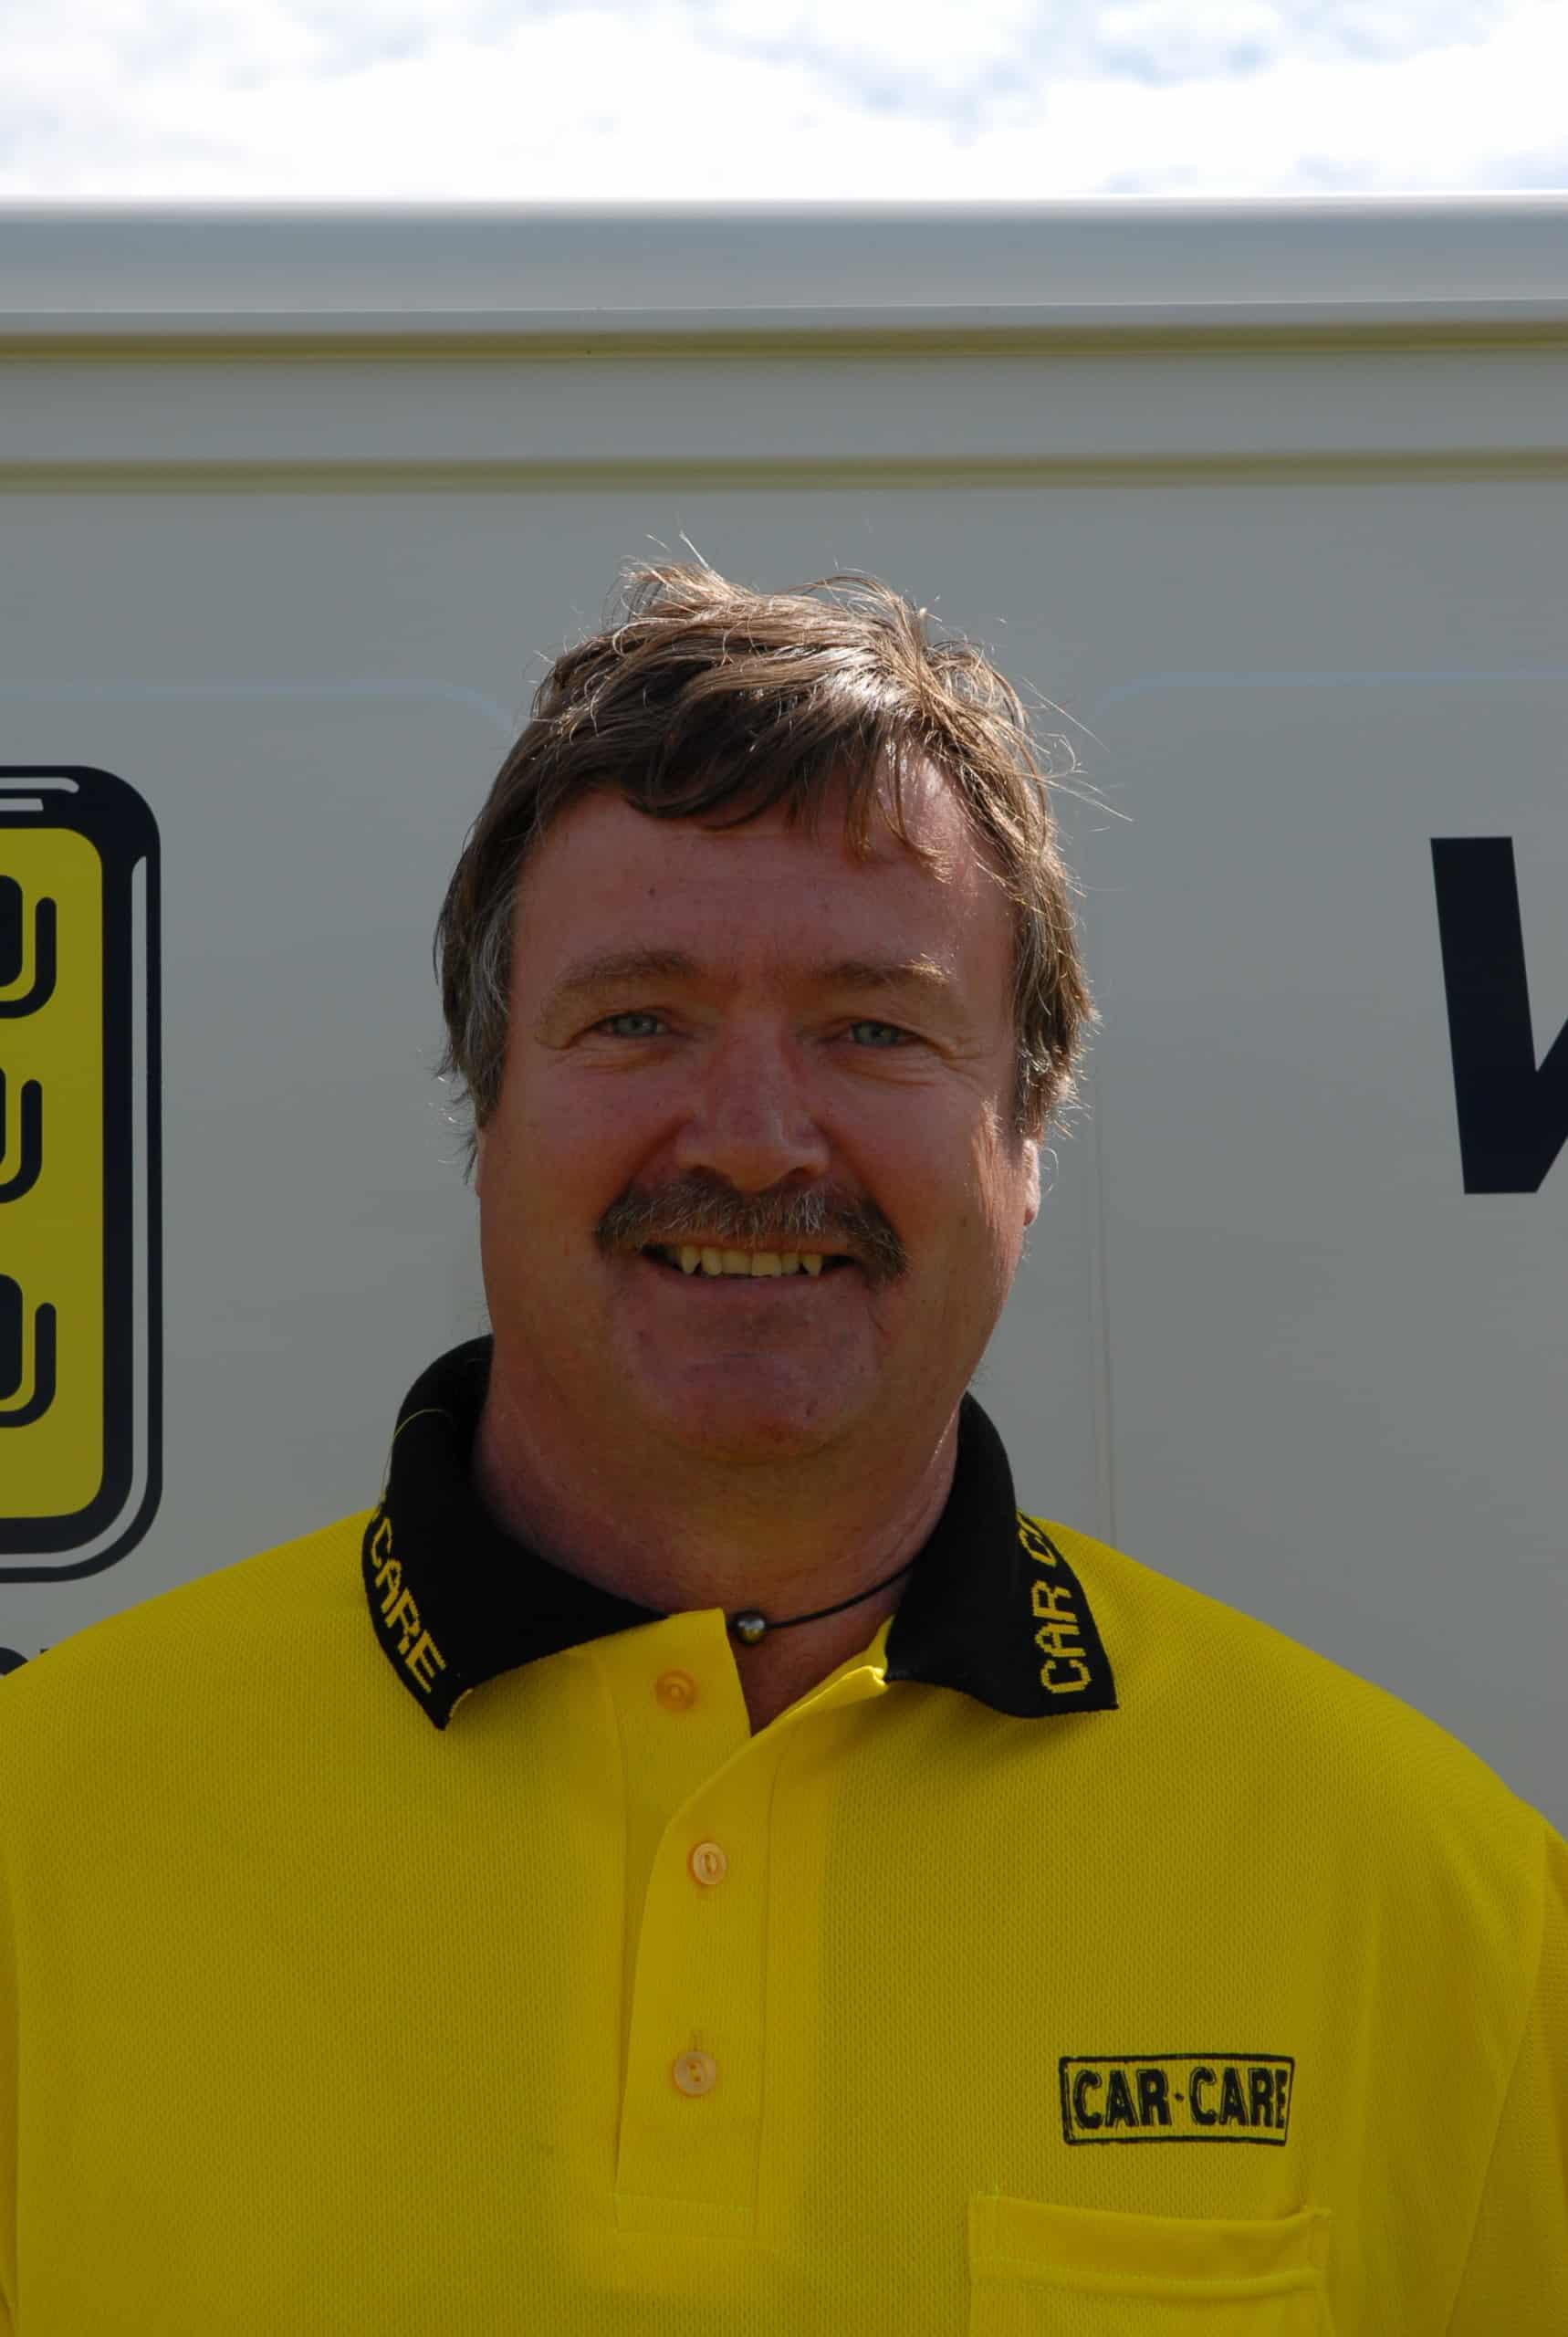 Alan at Car Care in Maddington